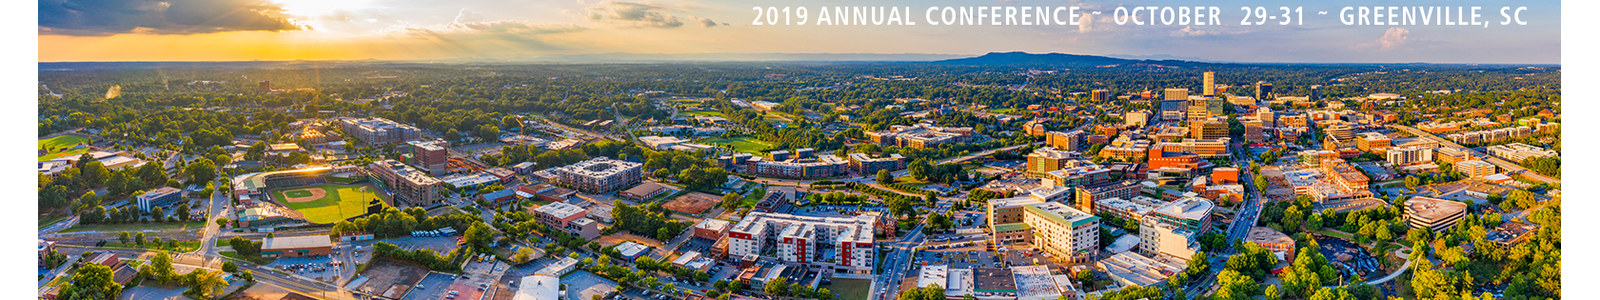 SCBIO 2019 Greenville SC